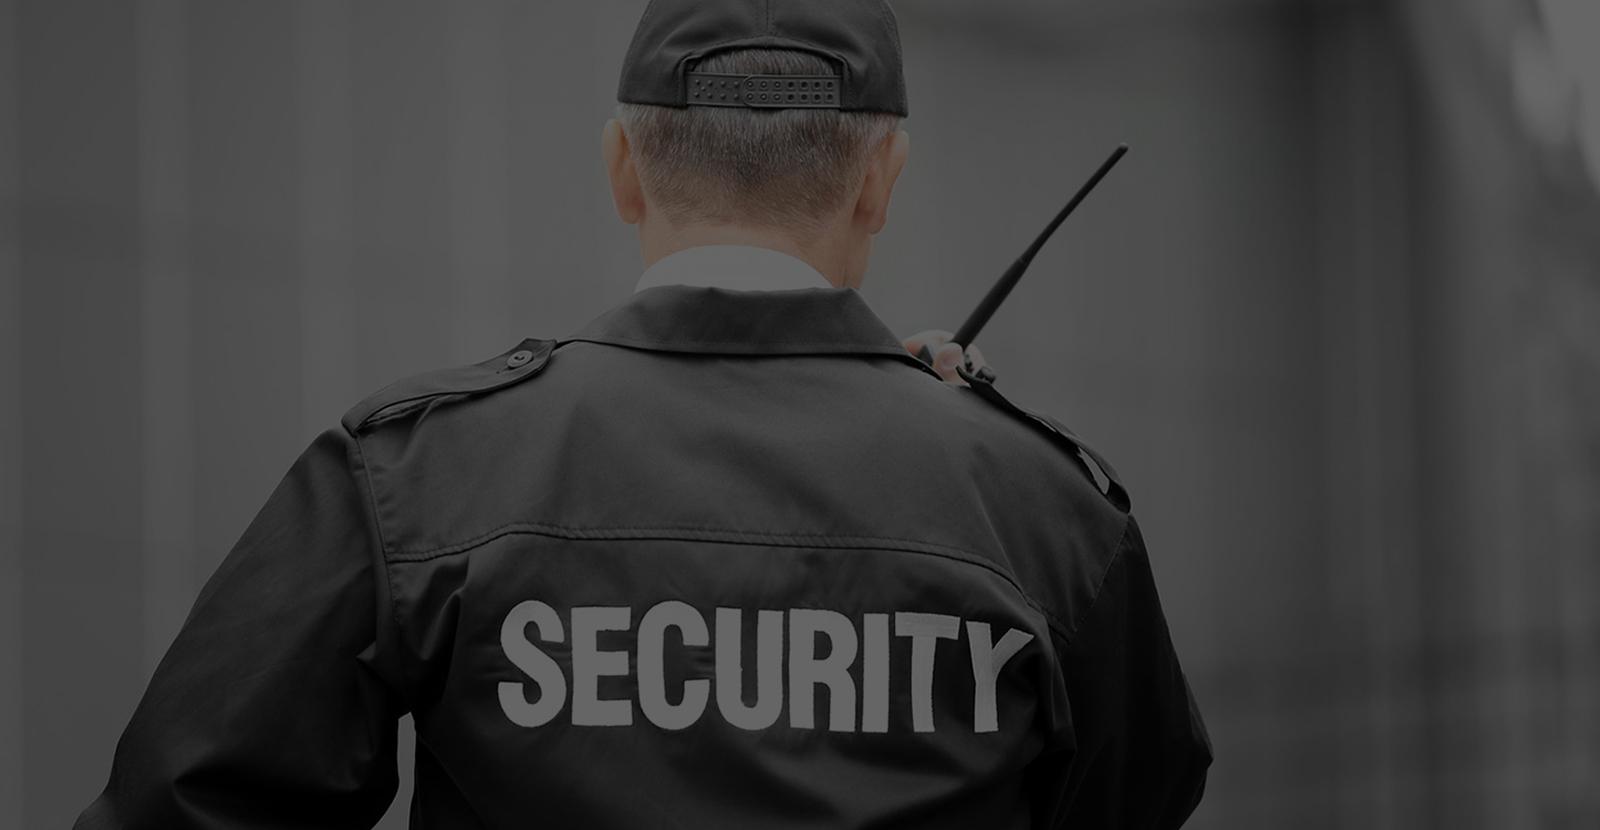 Security Services Dubai